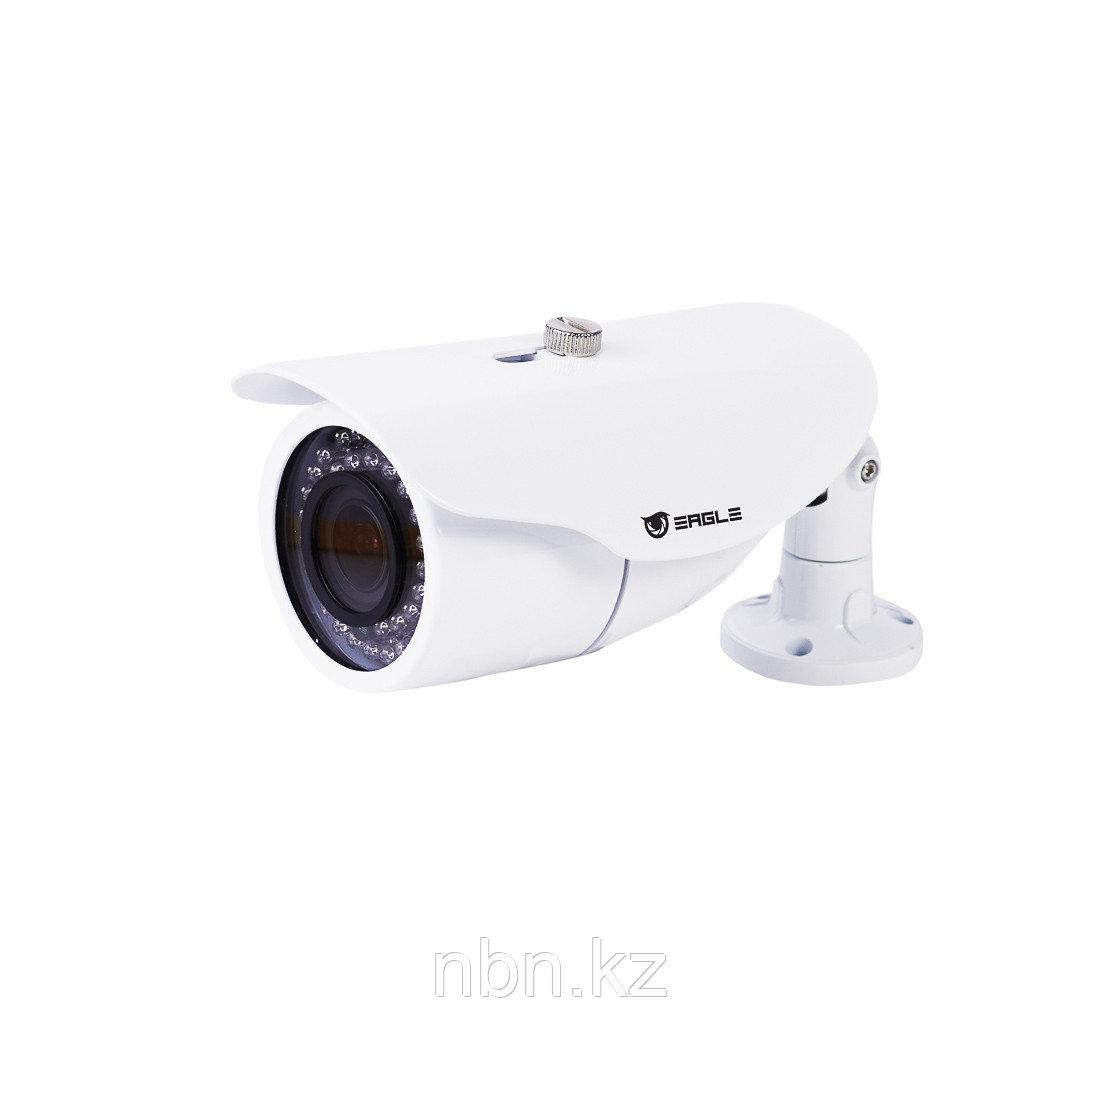 Цилиндрическая видеокамера EAGLE EGL-NBL375